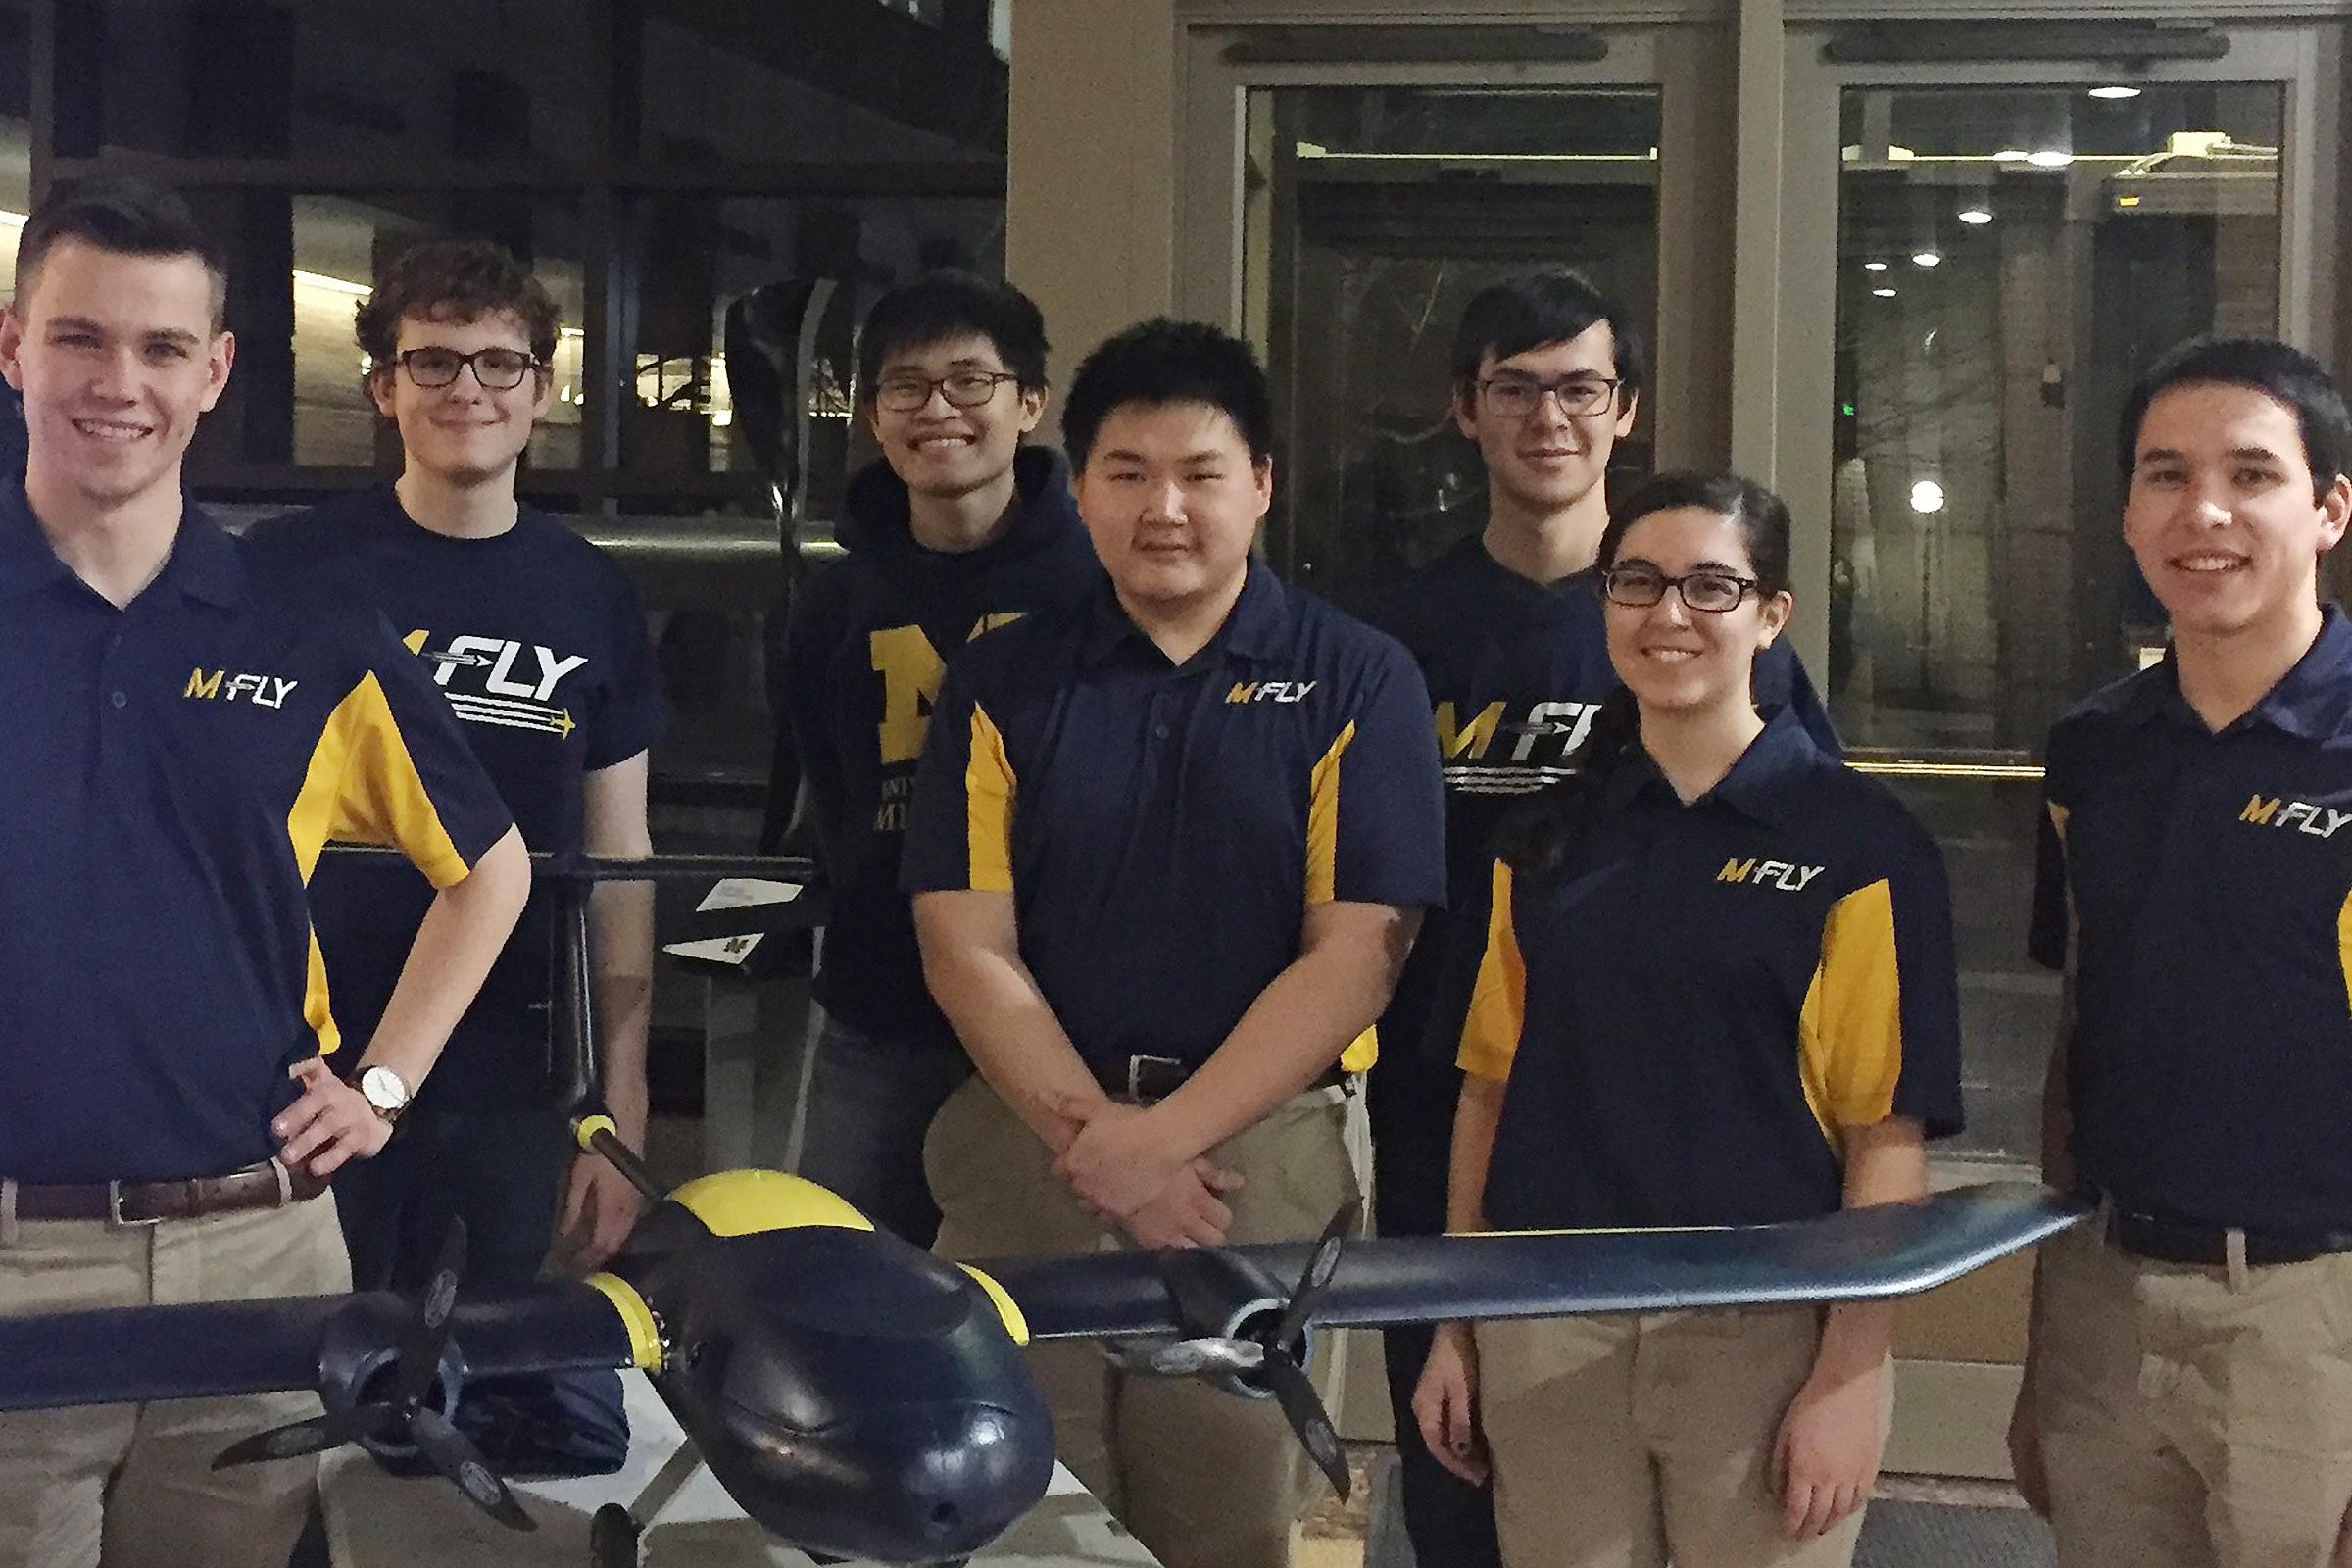 M-Fly 2018 team